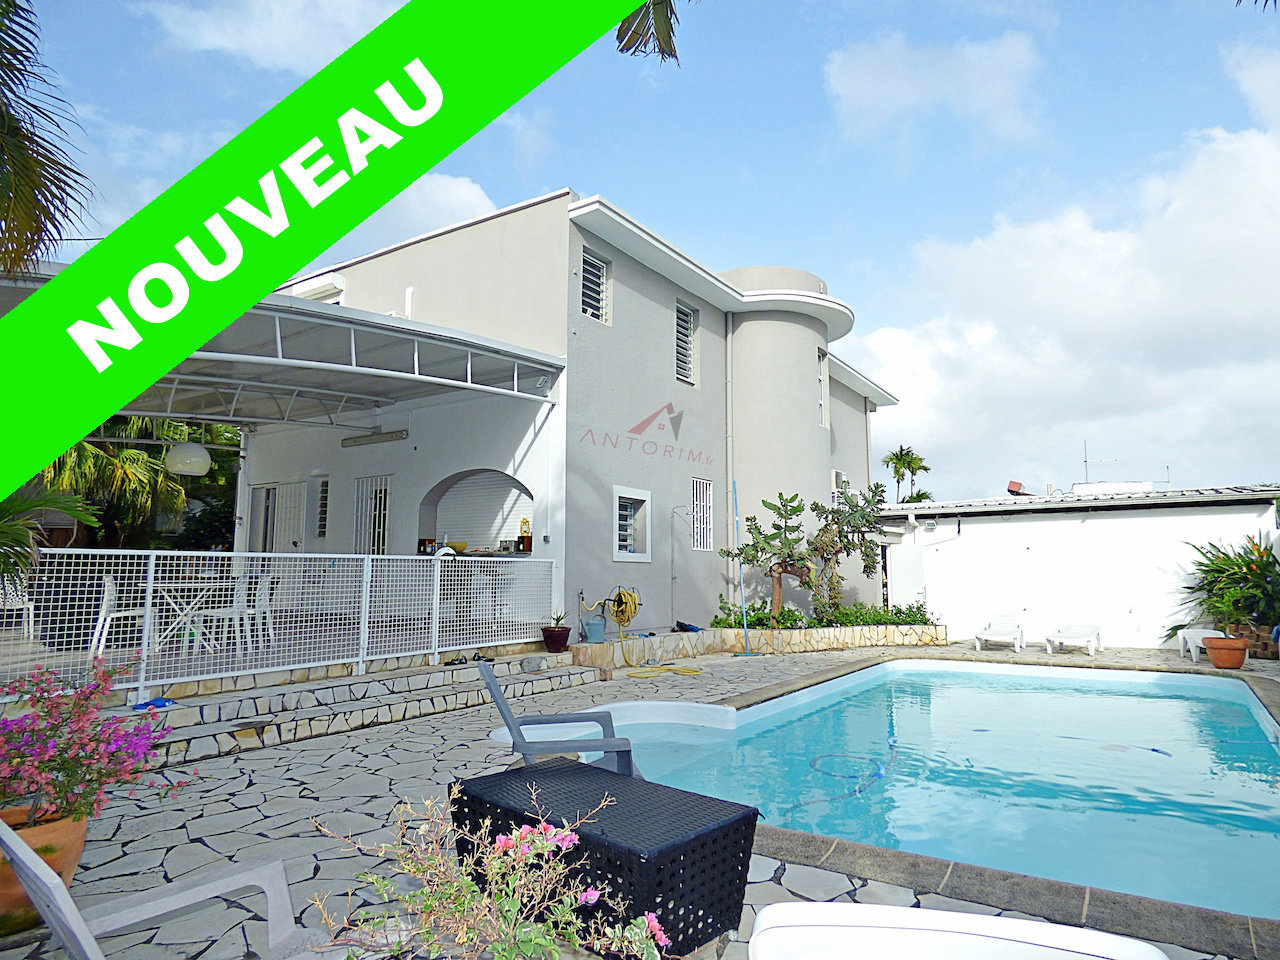 FORT-DE-FRANCE - DIDIER - Belle villa T5 - Piscine - Jardin - Calme